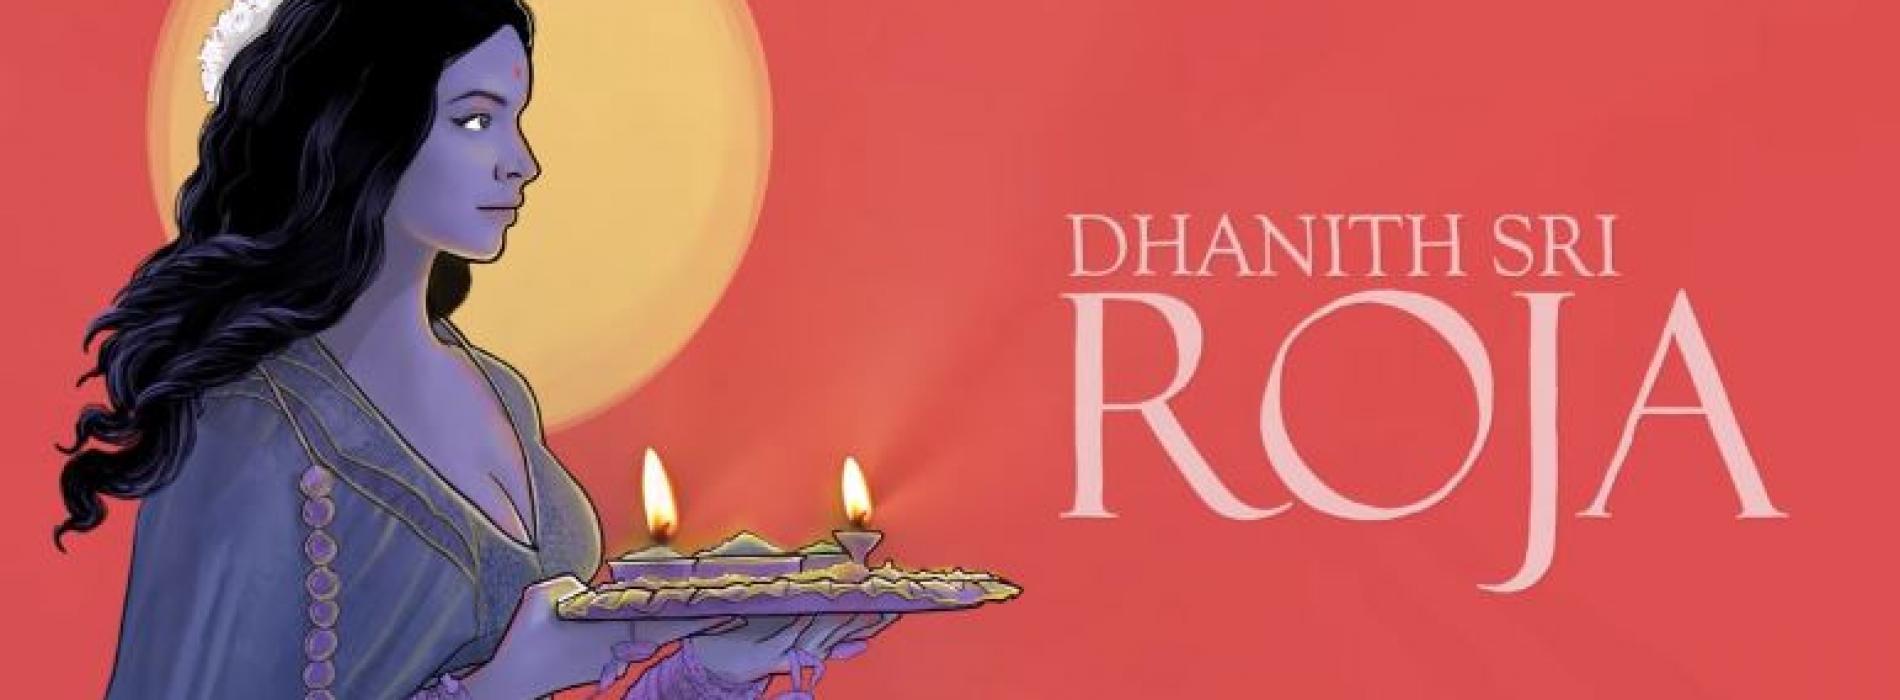 New Music : Dhanith Sri – Roja (රෝජා) Official Lyric Video | Album Alokawarsha